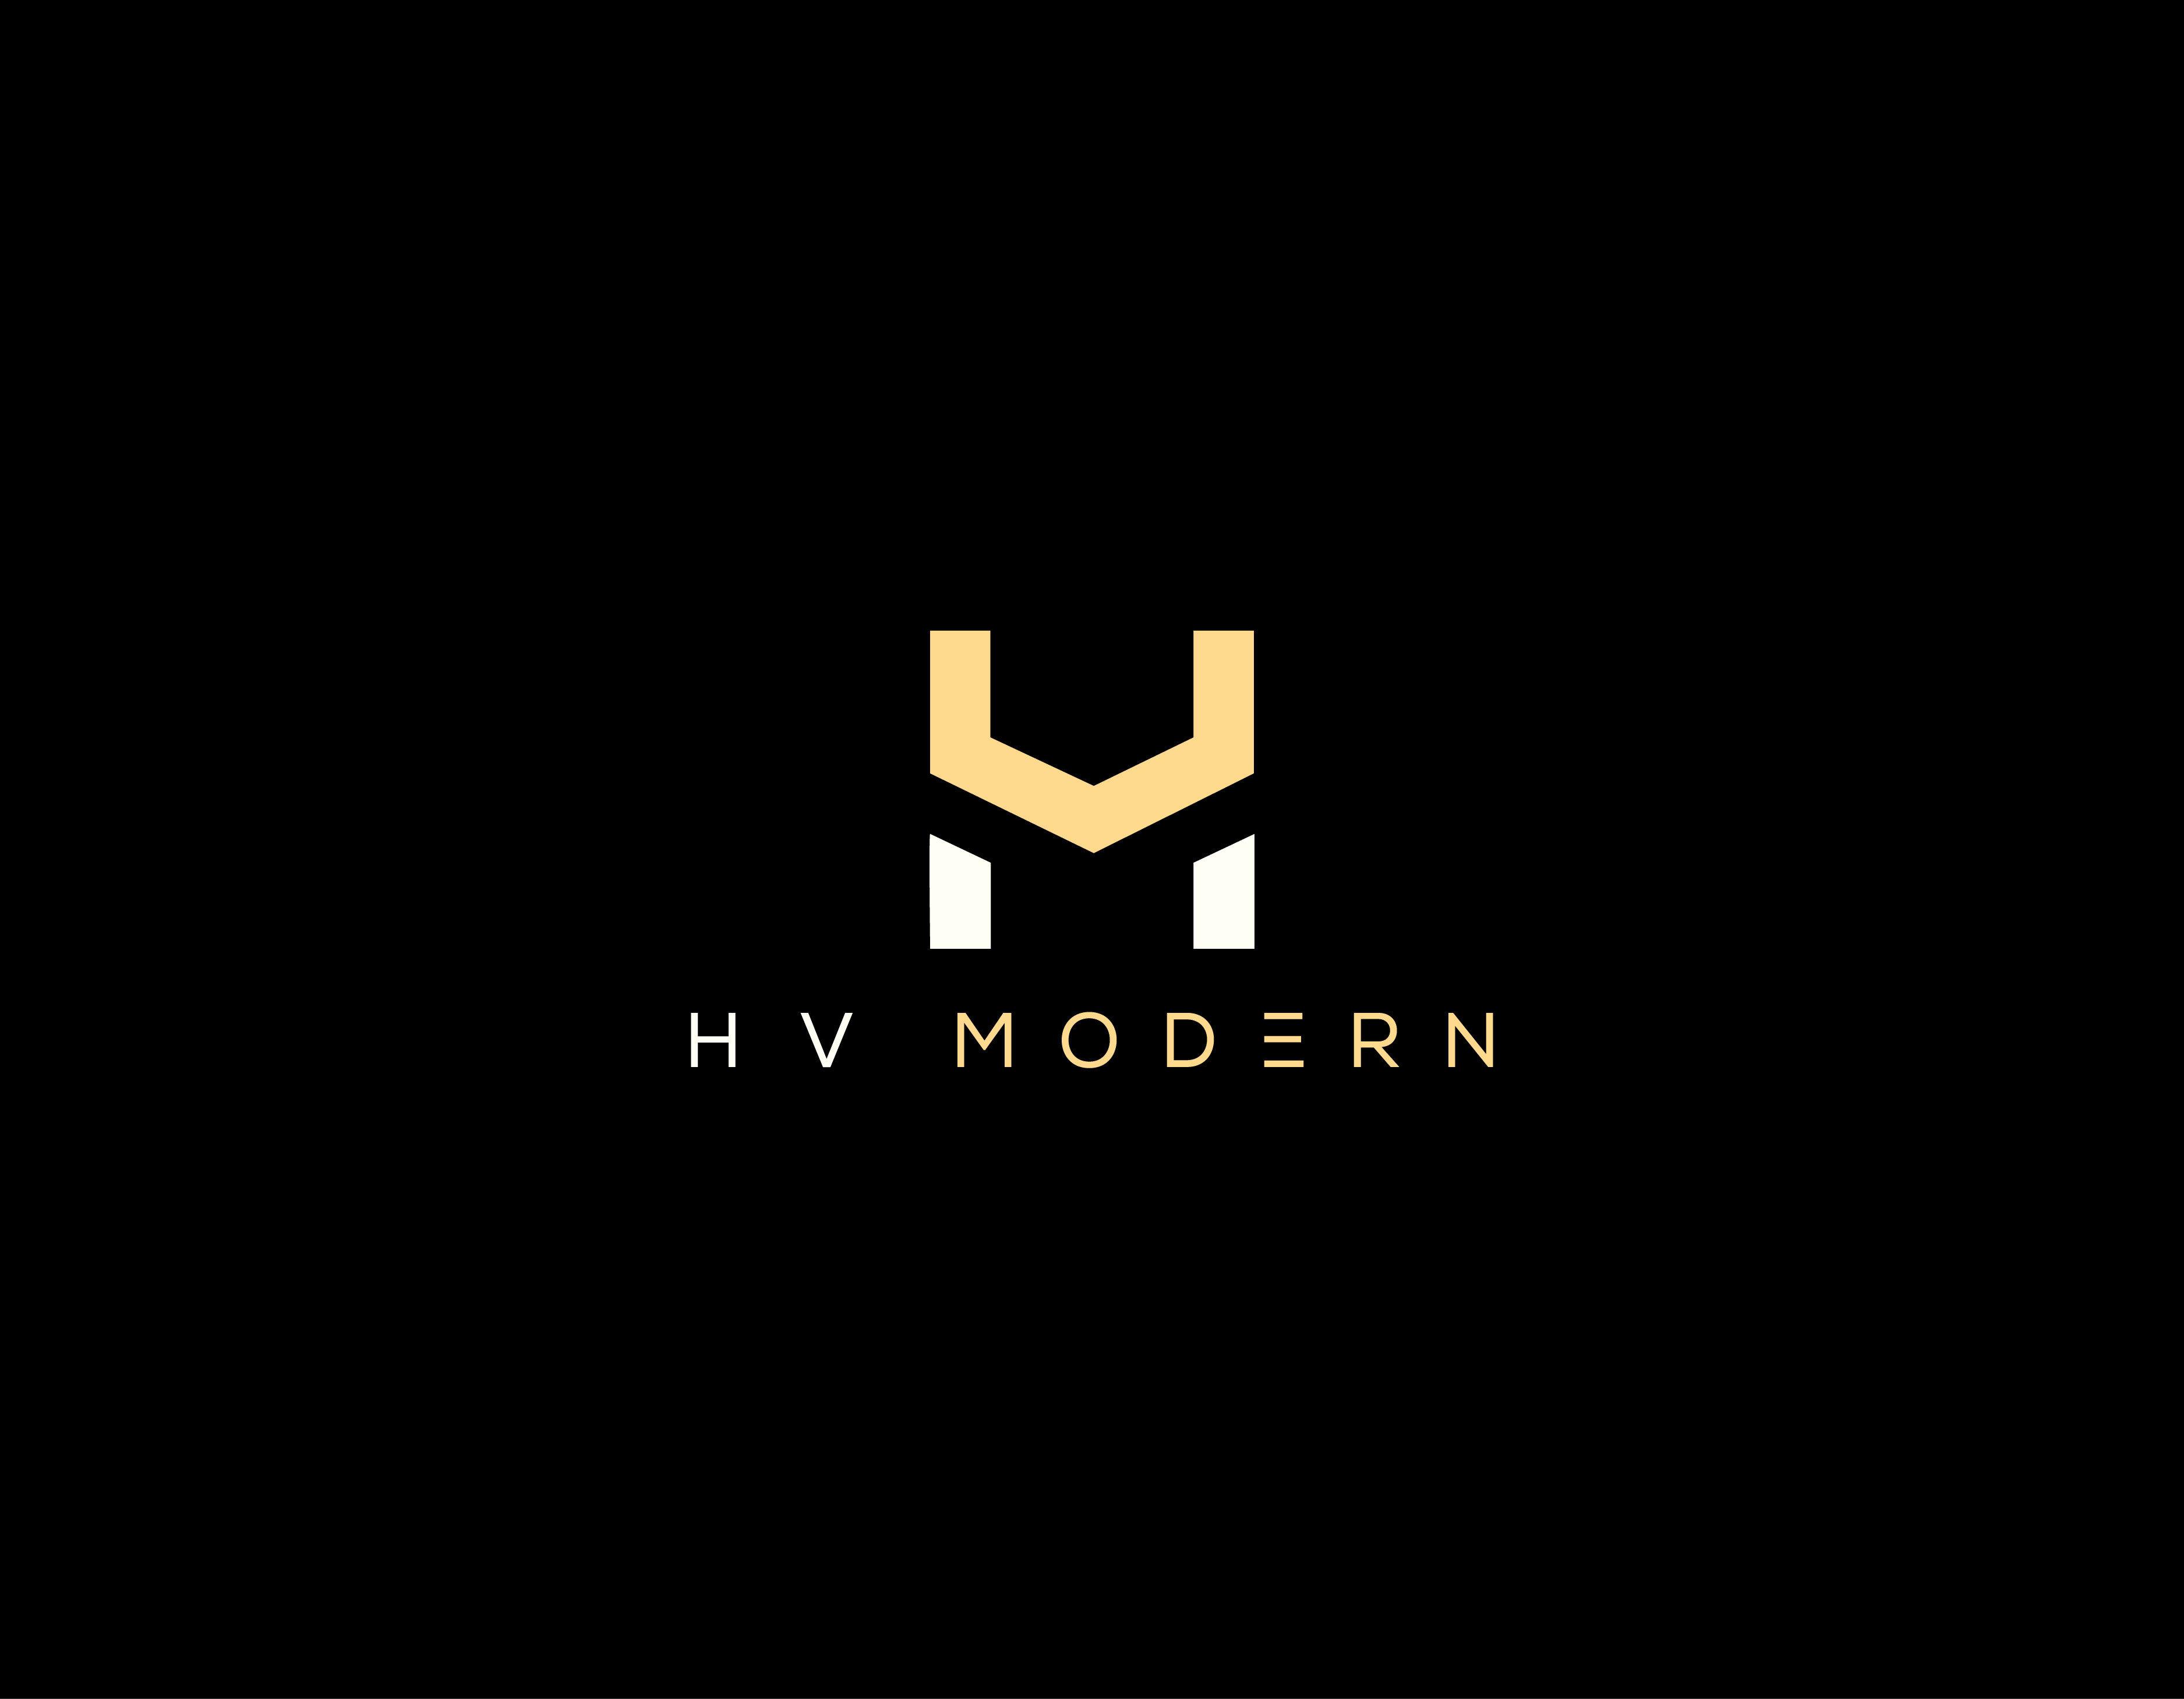 Design 3 Minimalist Logo In 12 Hours By Supremedezign